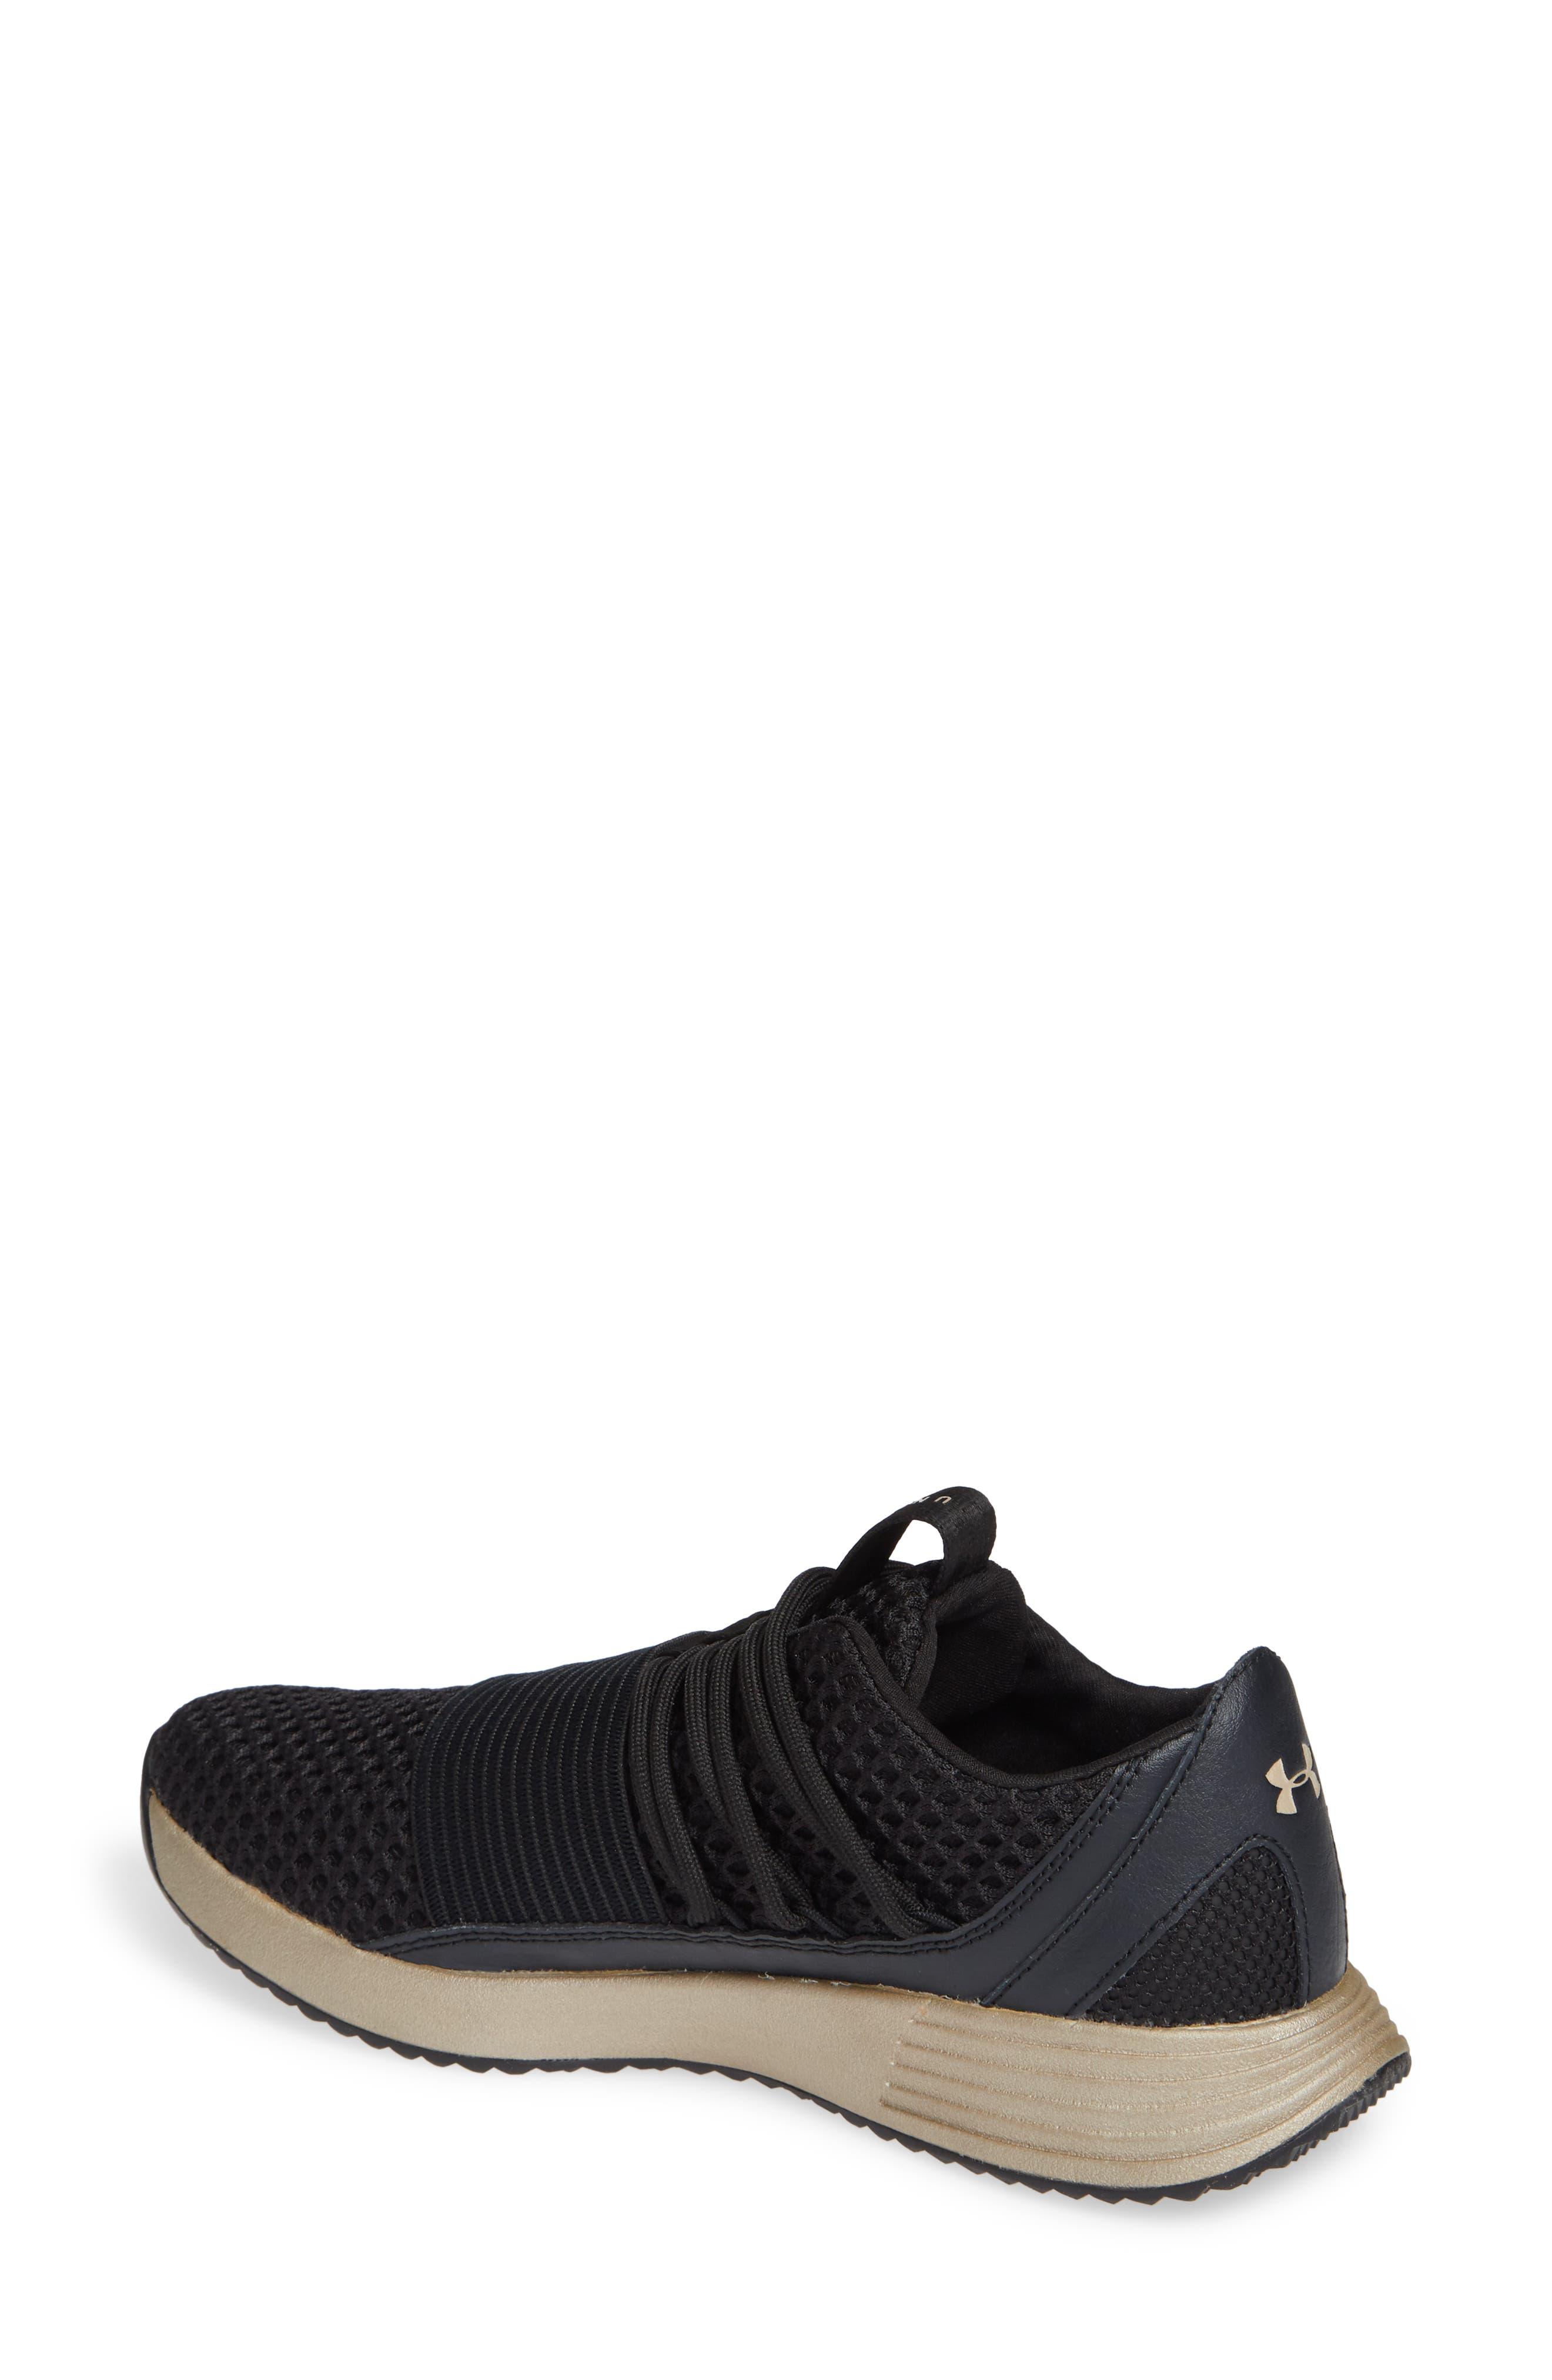 Breathe Lace X NM Sneaker,                             Alternate thumbnail 2, color,                             BLACK/ METALLIC FADED GOLD